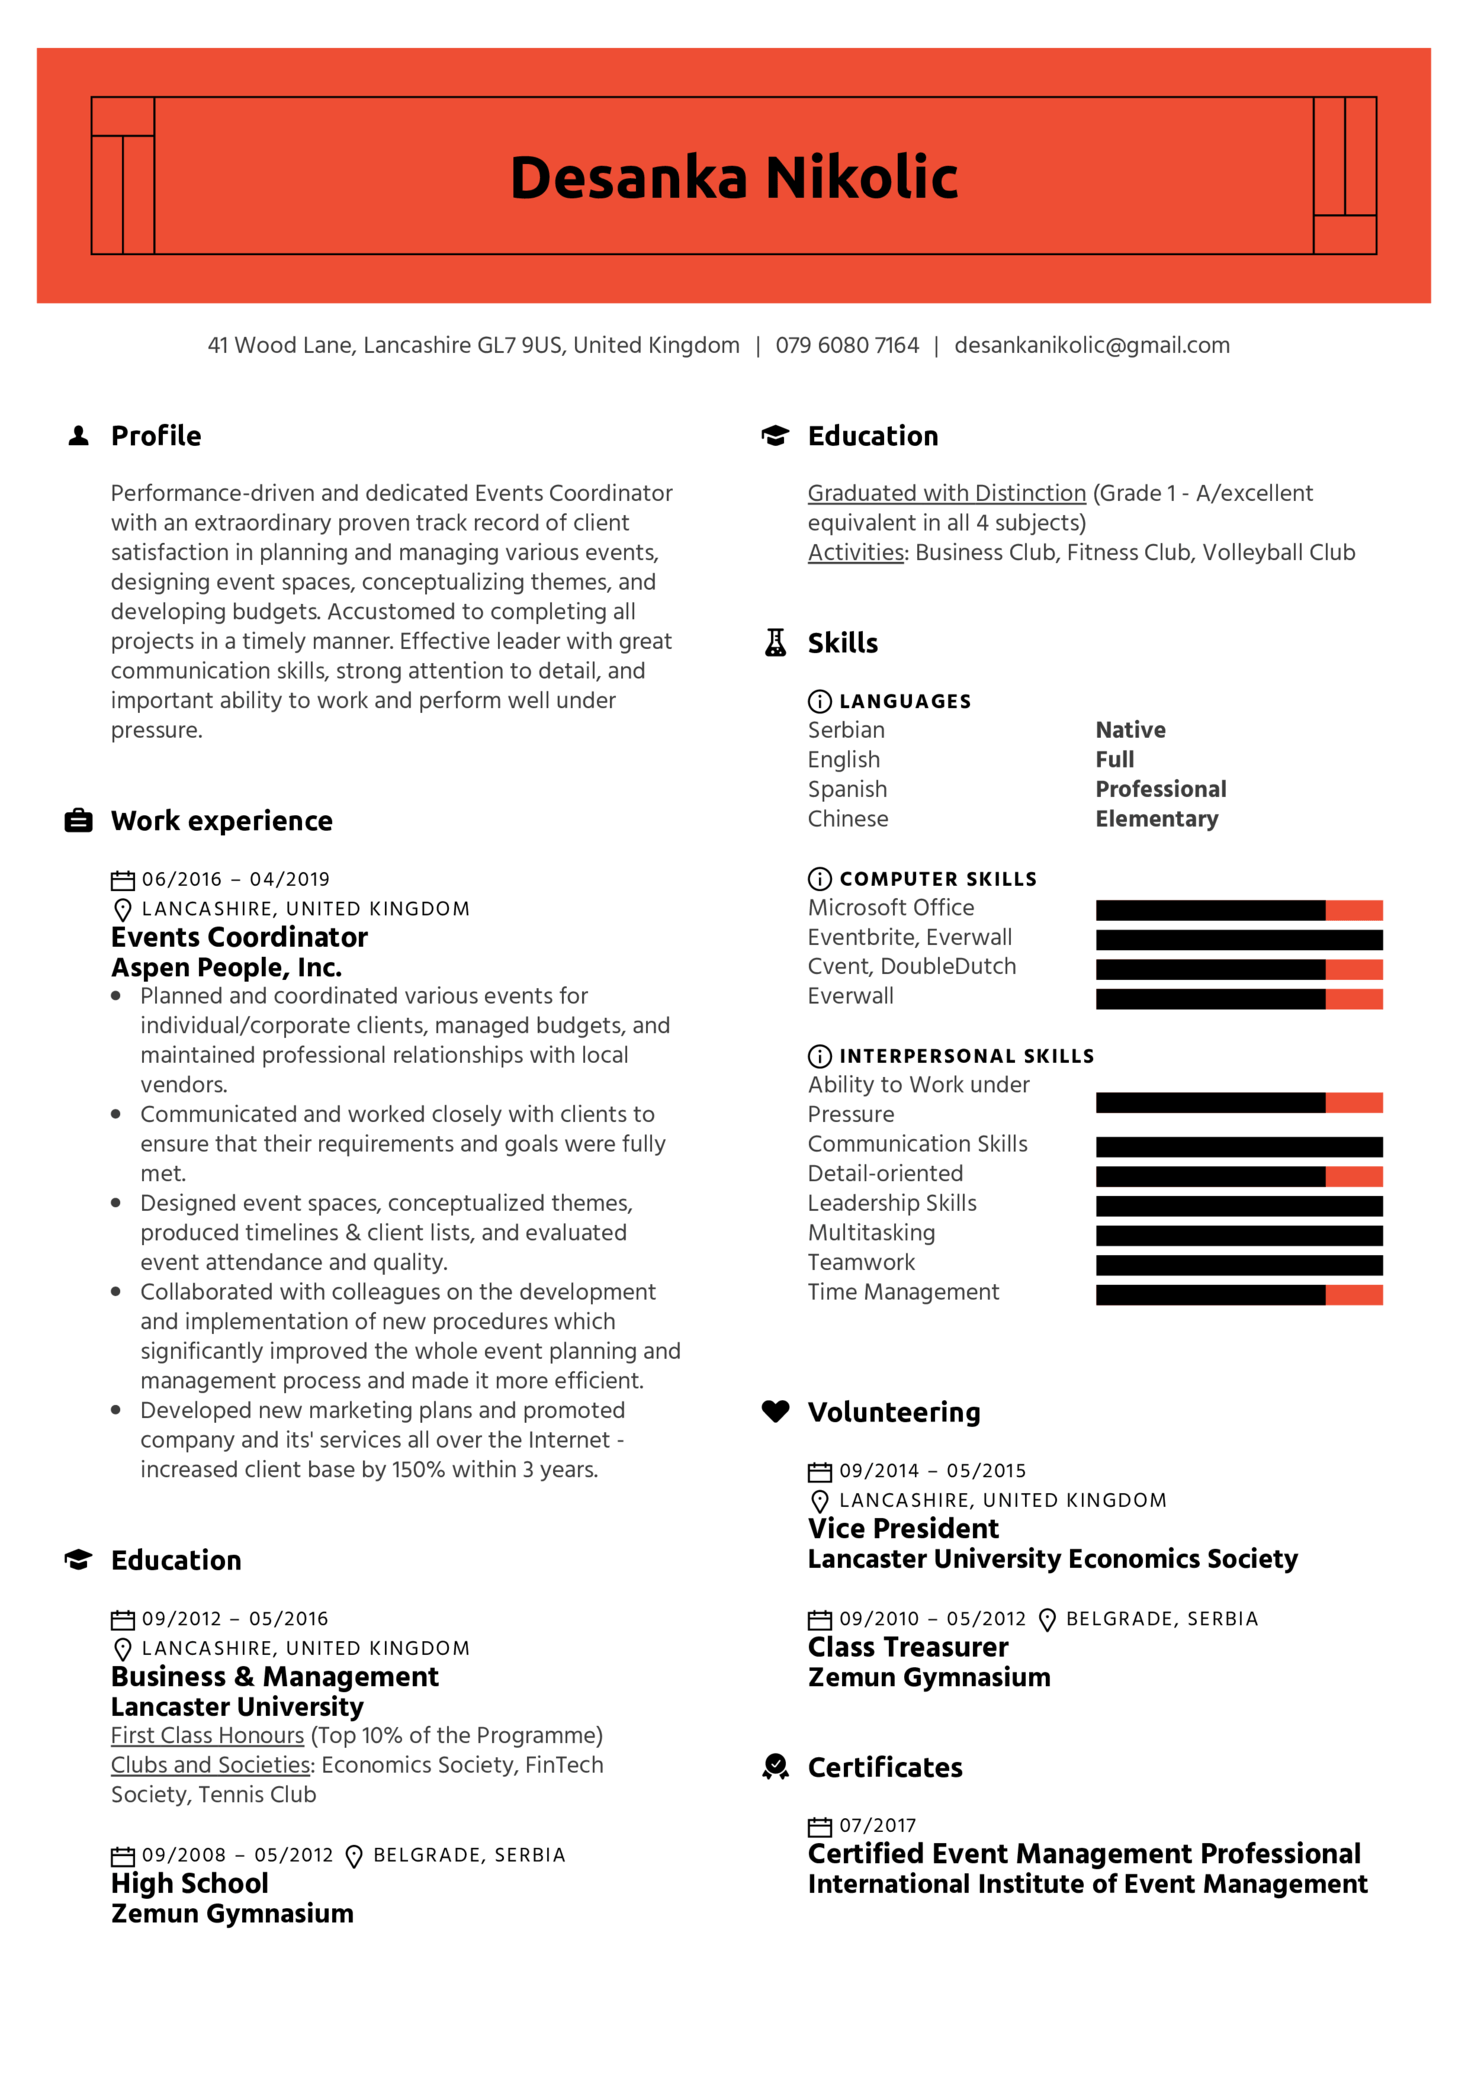 Events Coordinator Resume Example (parte 1)